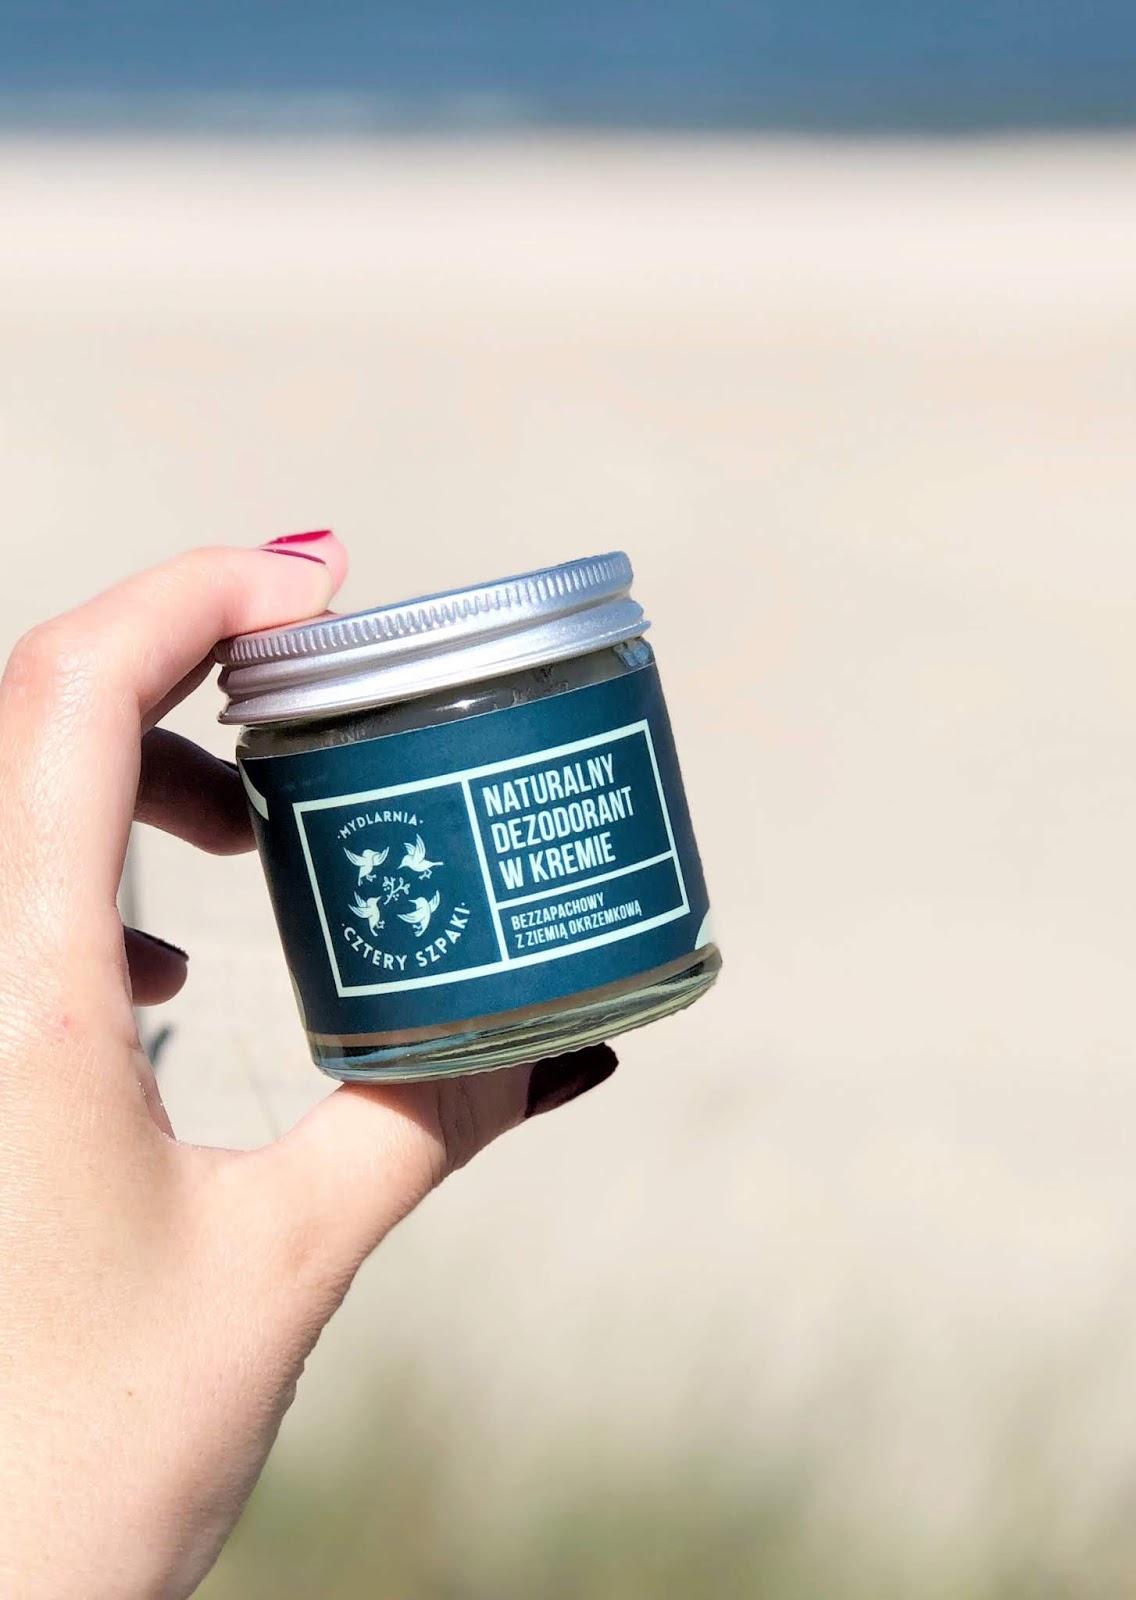 naturalny-dezodorant-4-szpaki